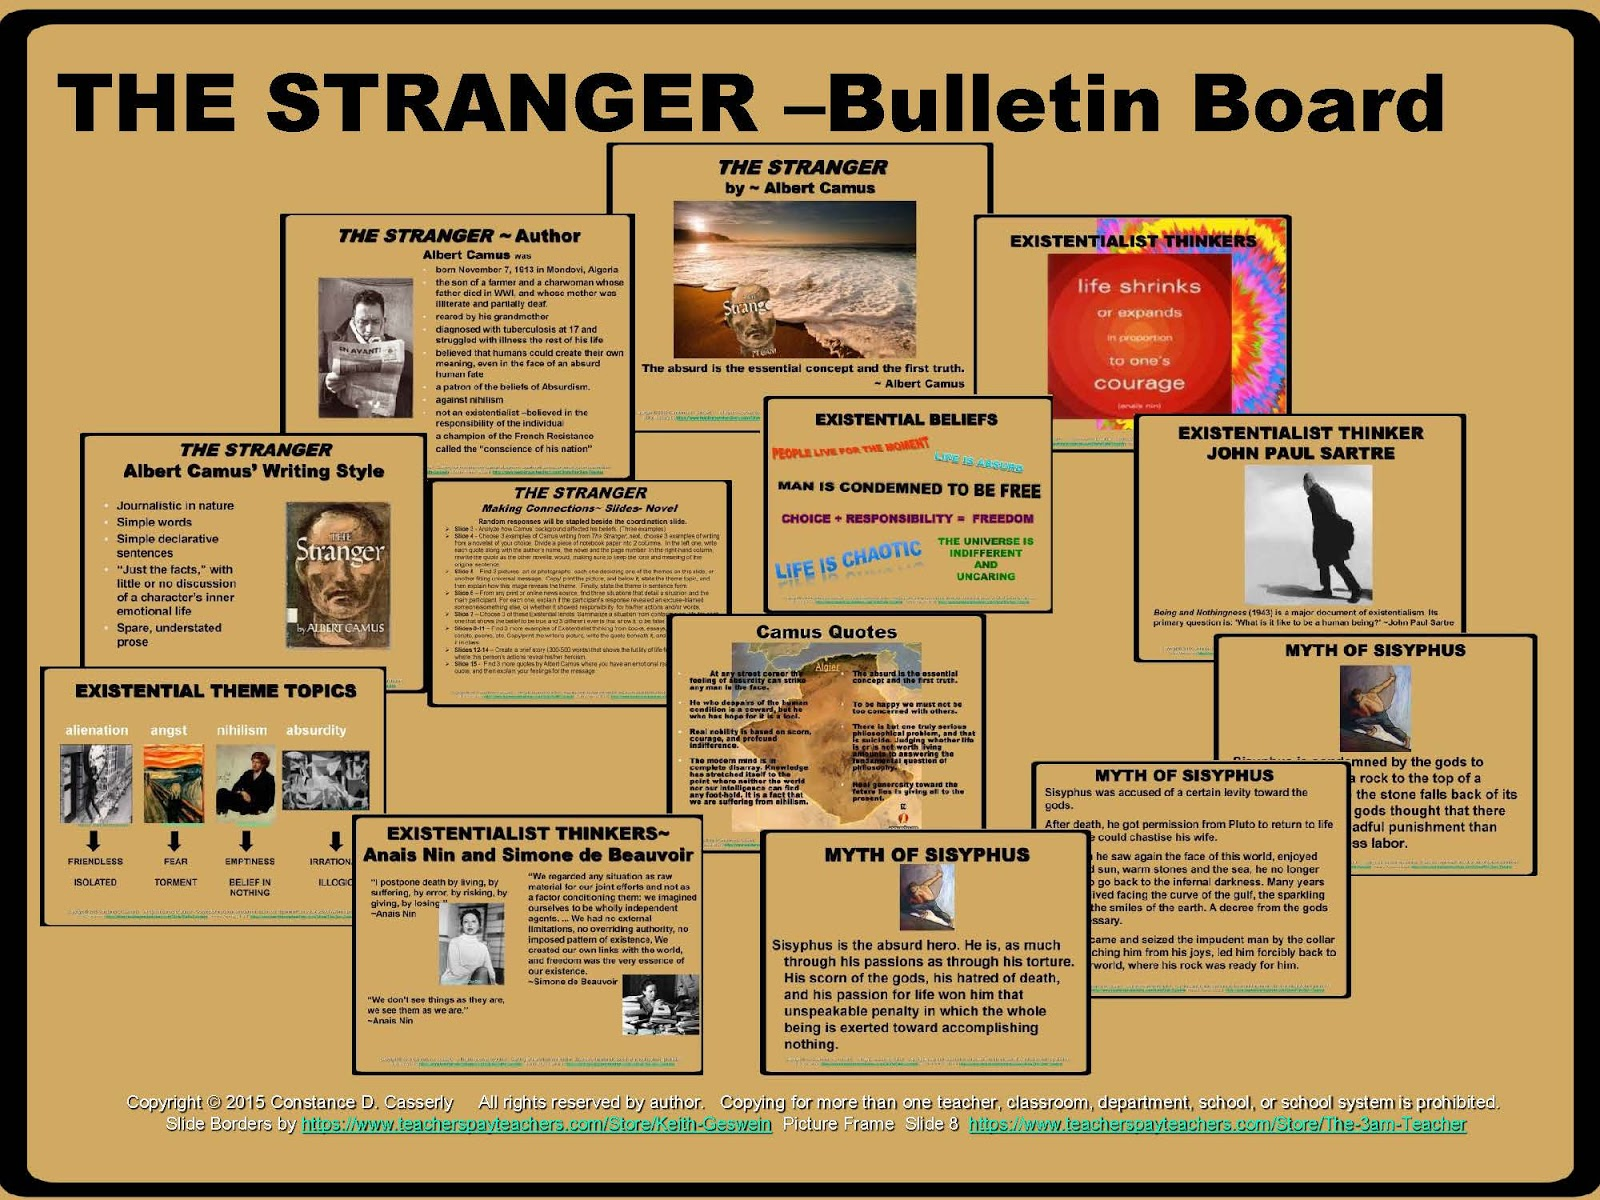 teach it write literature novel ideas albert camus the stranger bulletin board